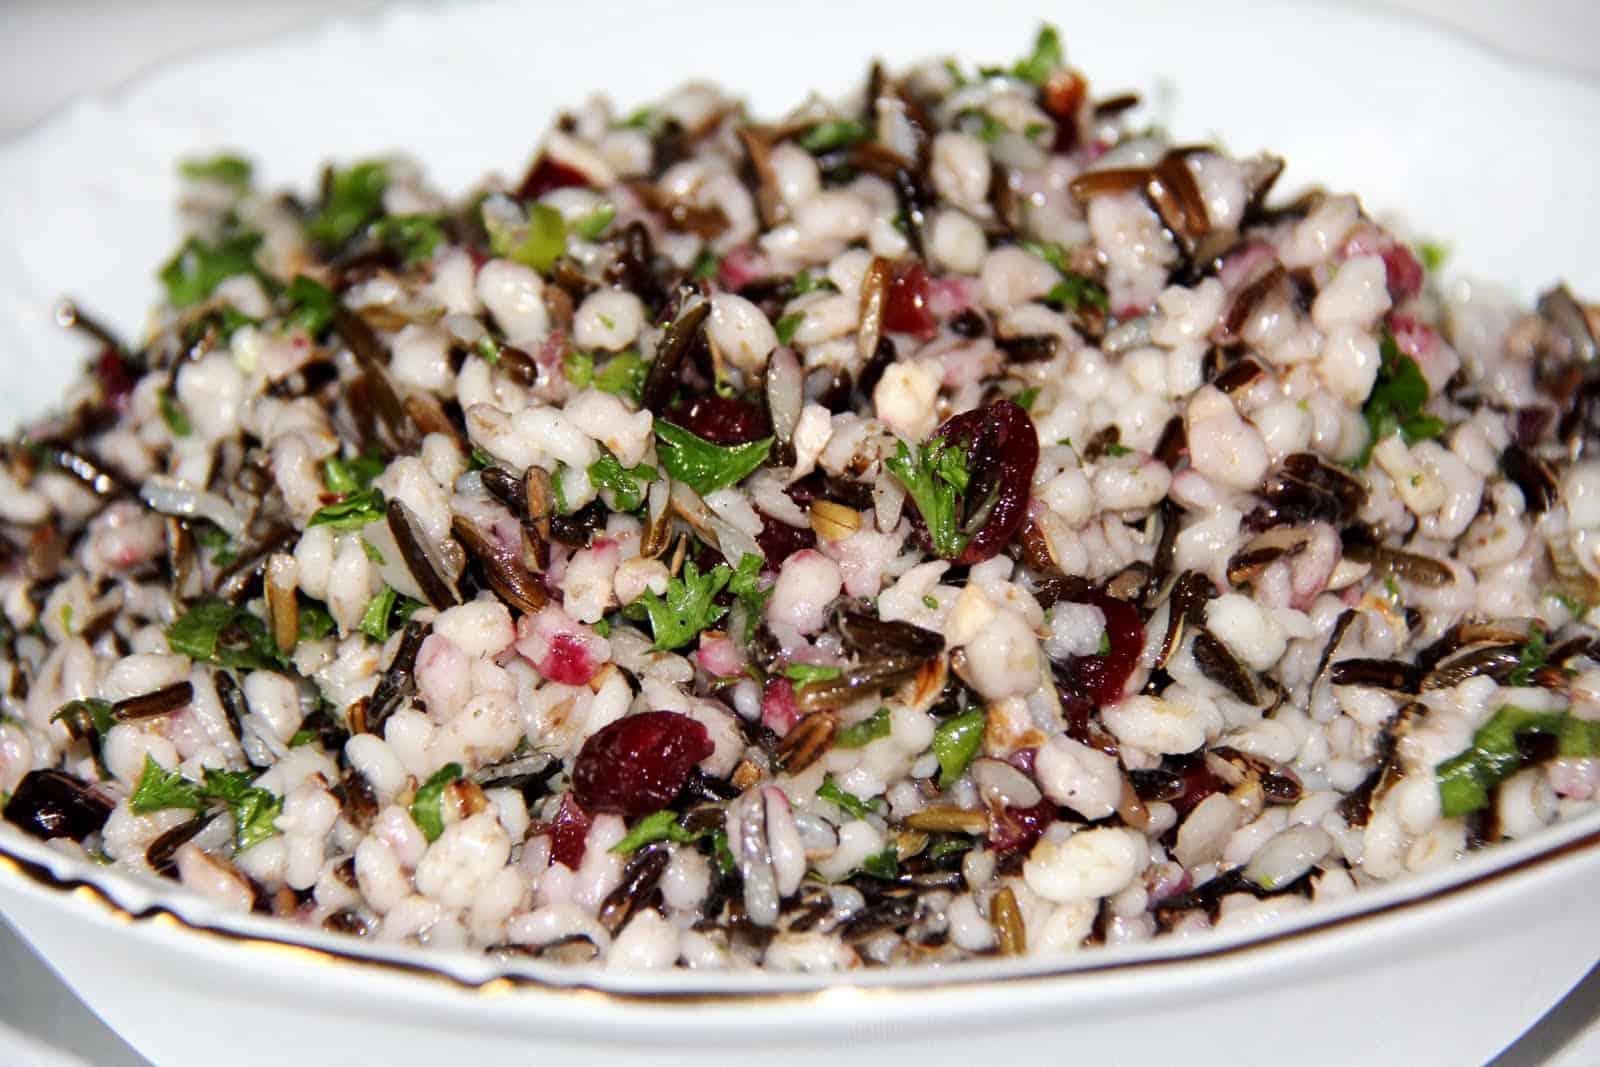 Wild rice and barley salad